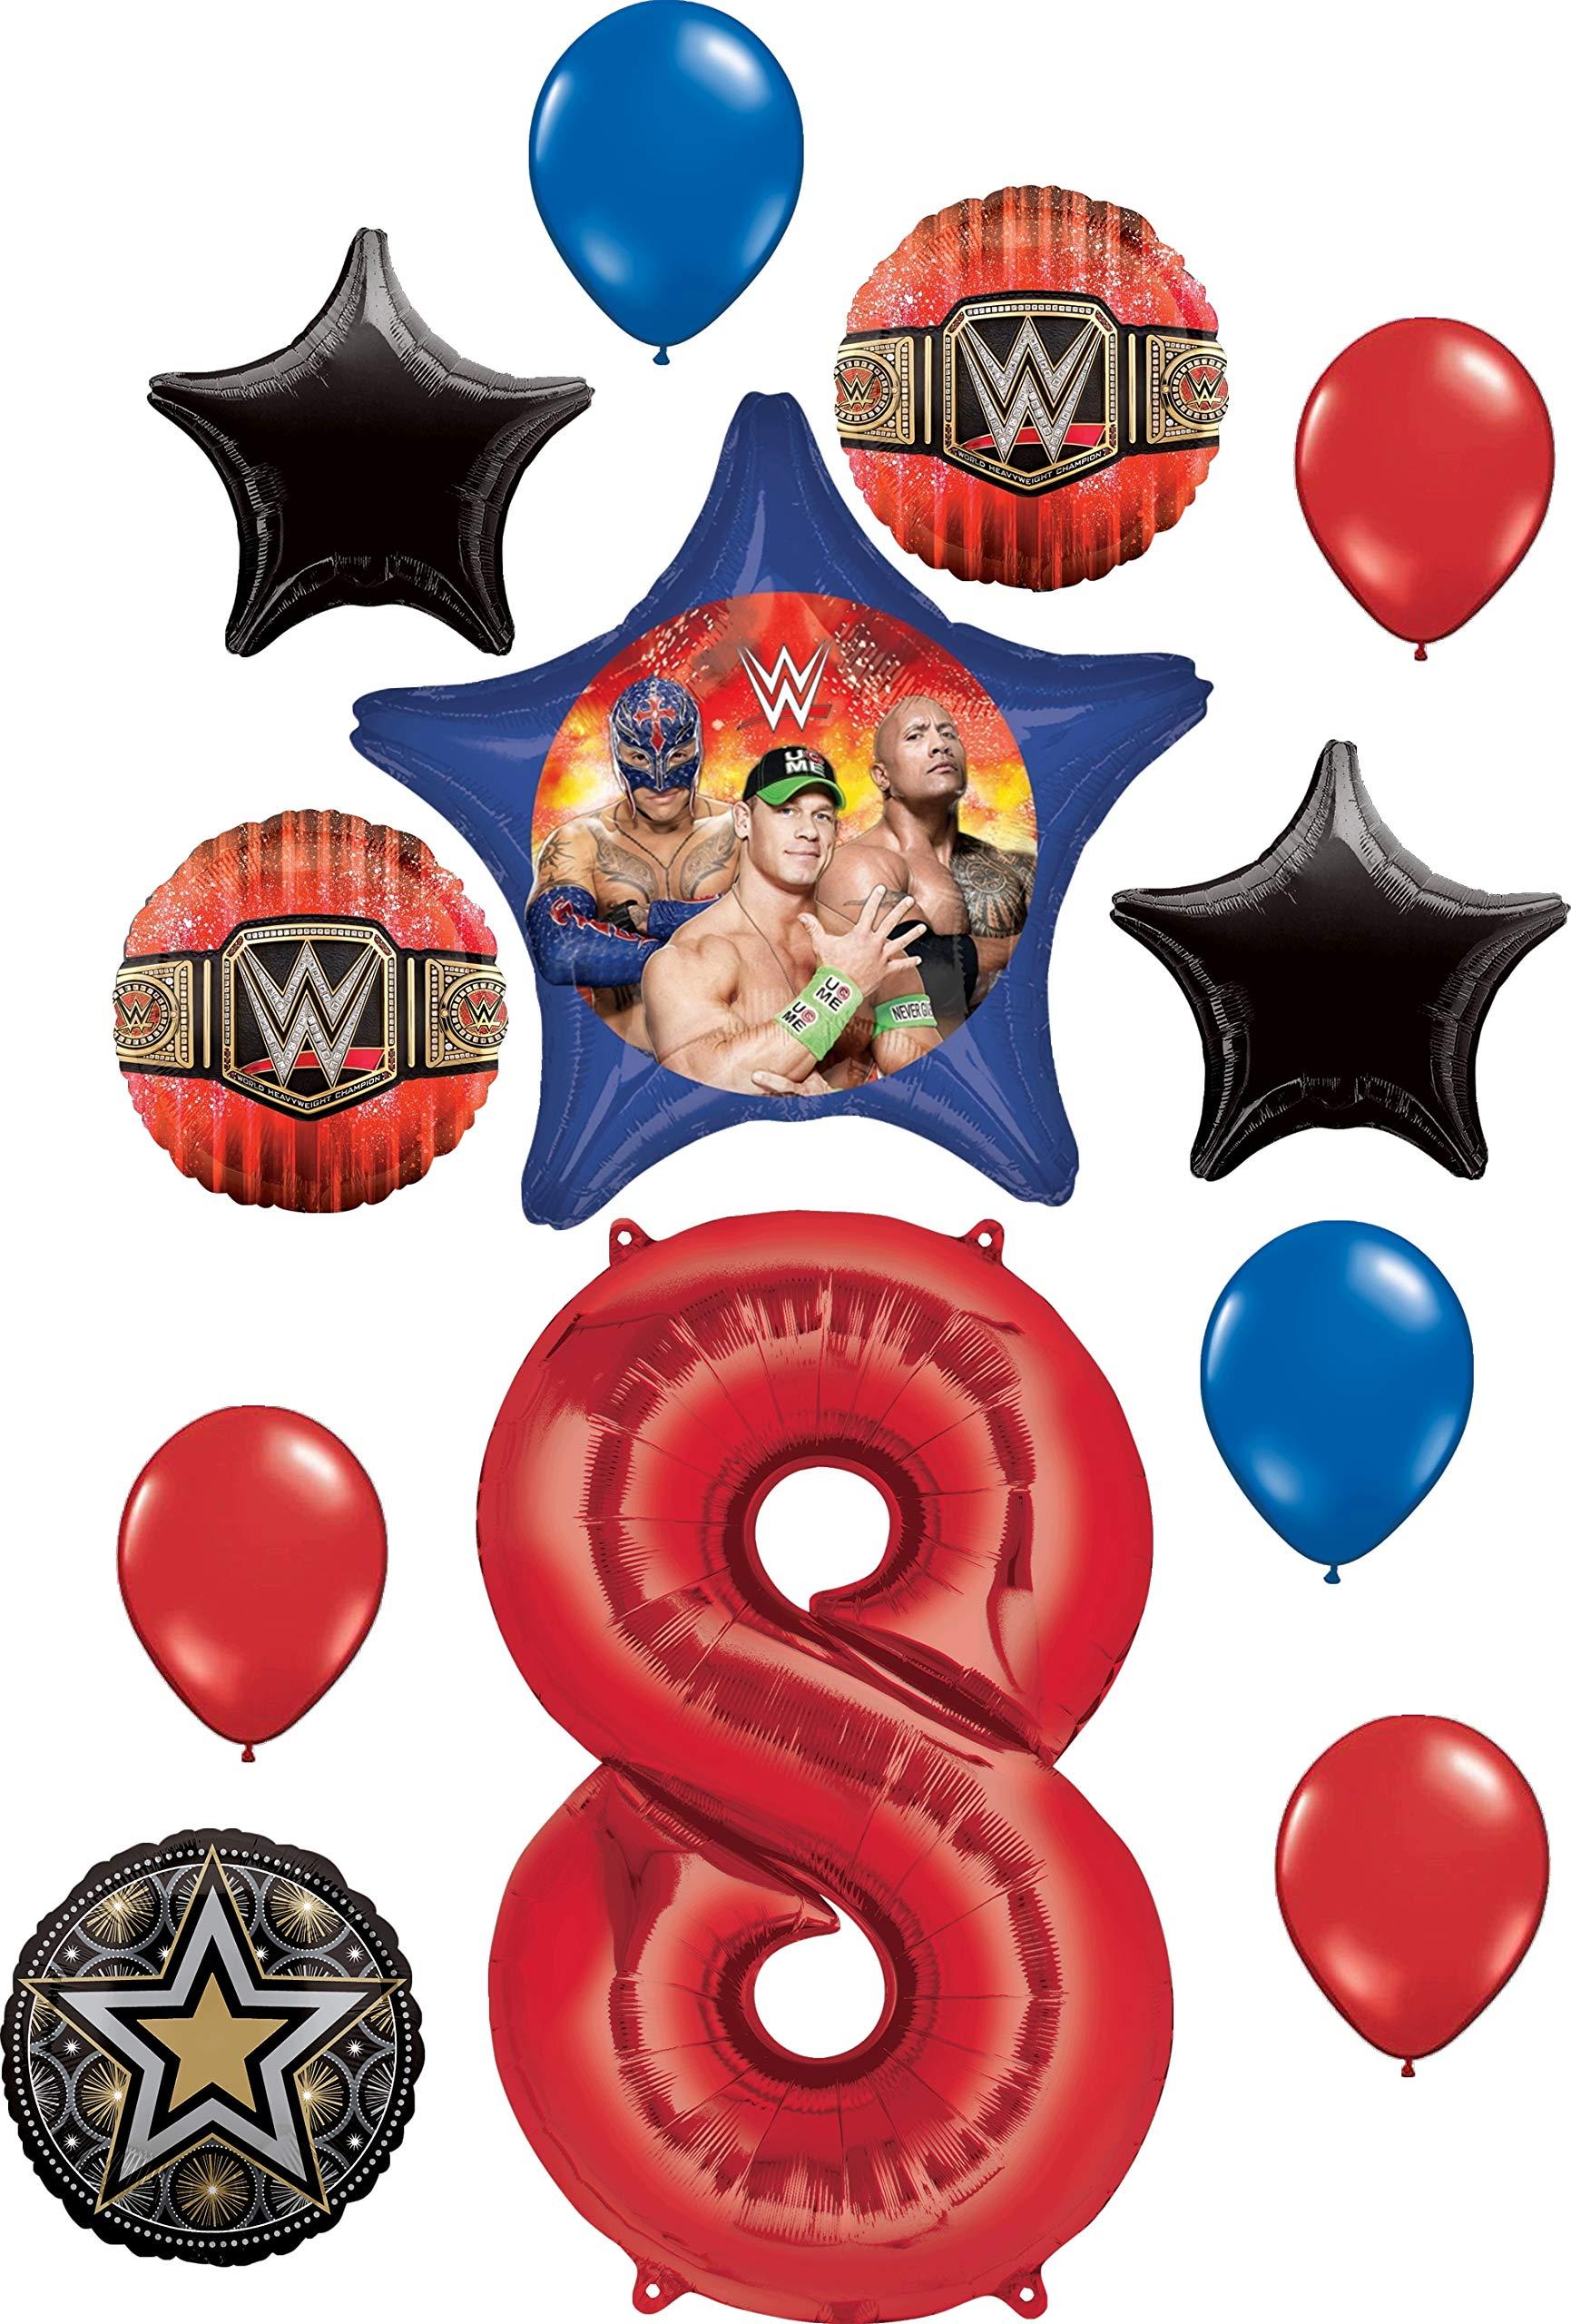 Wwe Party Supplies 8th Birthday Balloon Bouquet Decorations Walmart Com Walmart Com